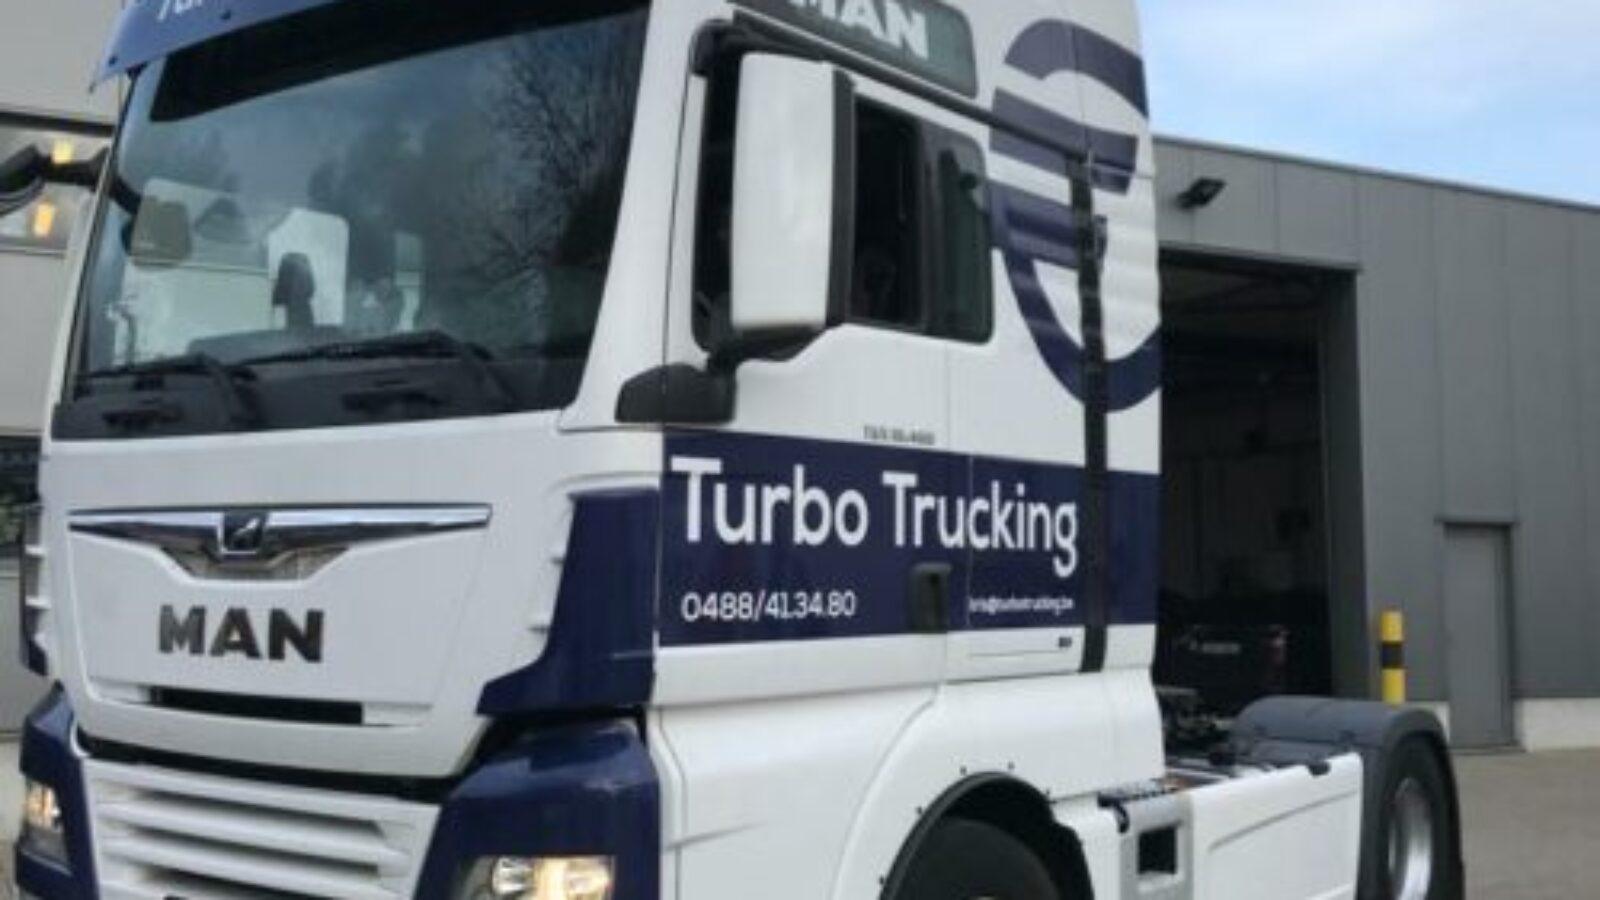 Turbo Trucking wagenbelettering vrachtwagen